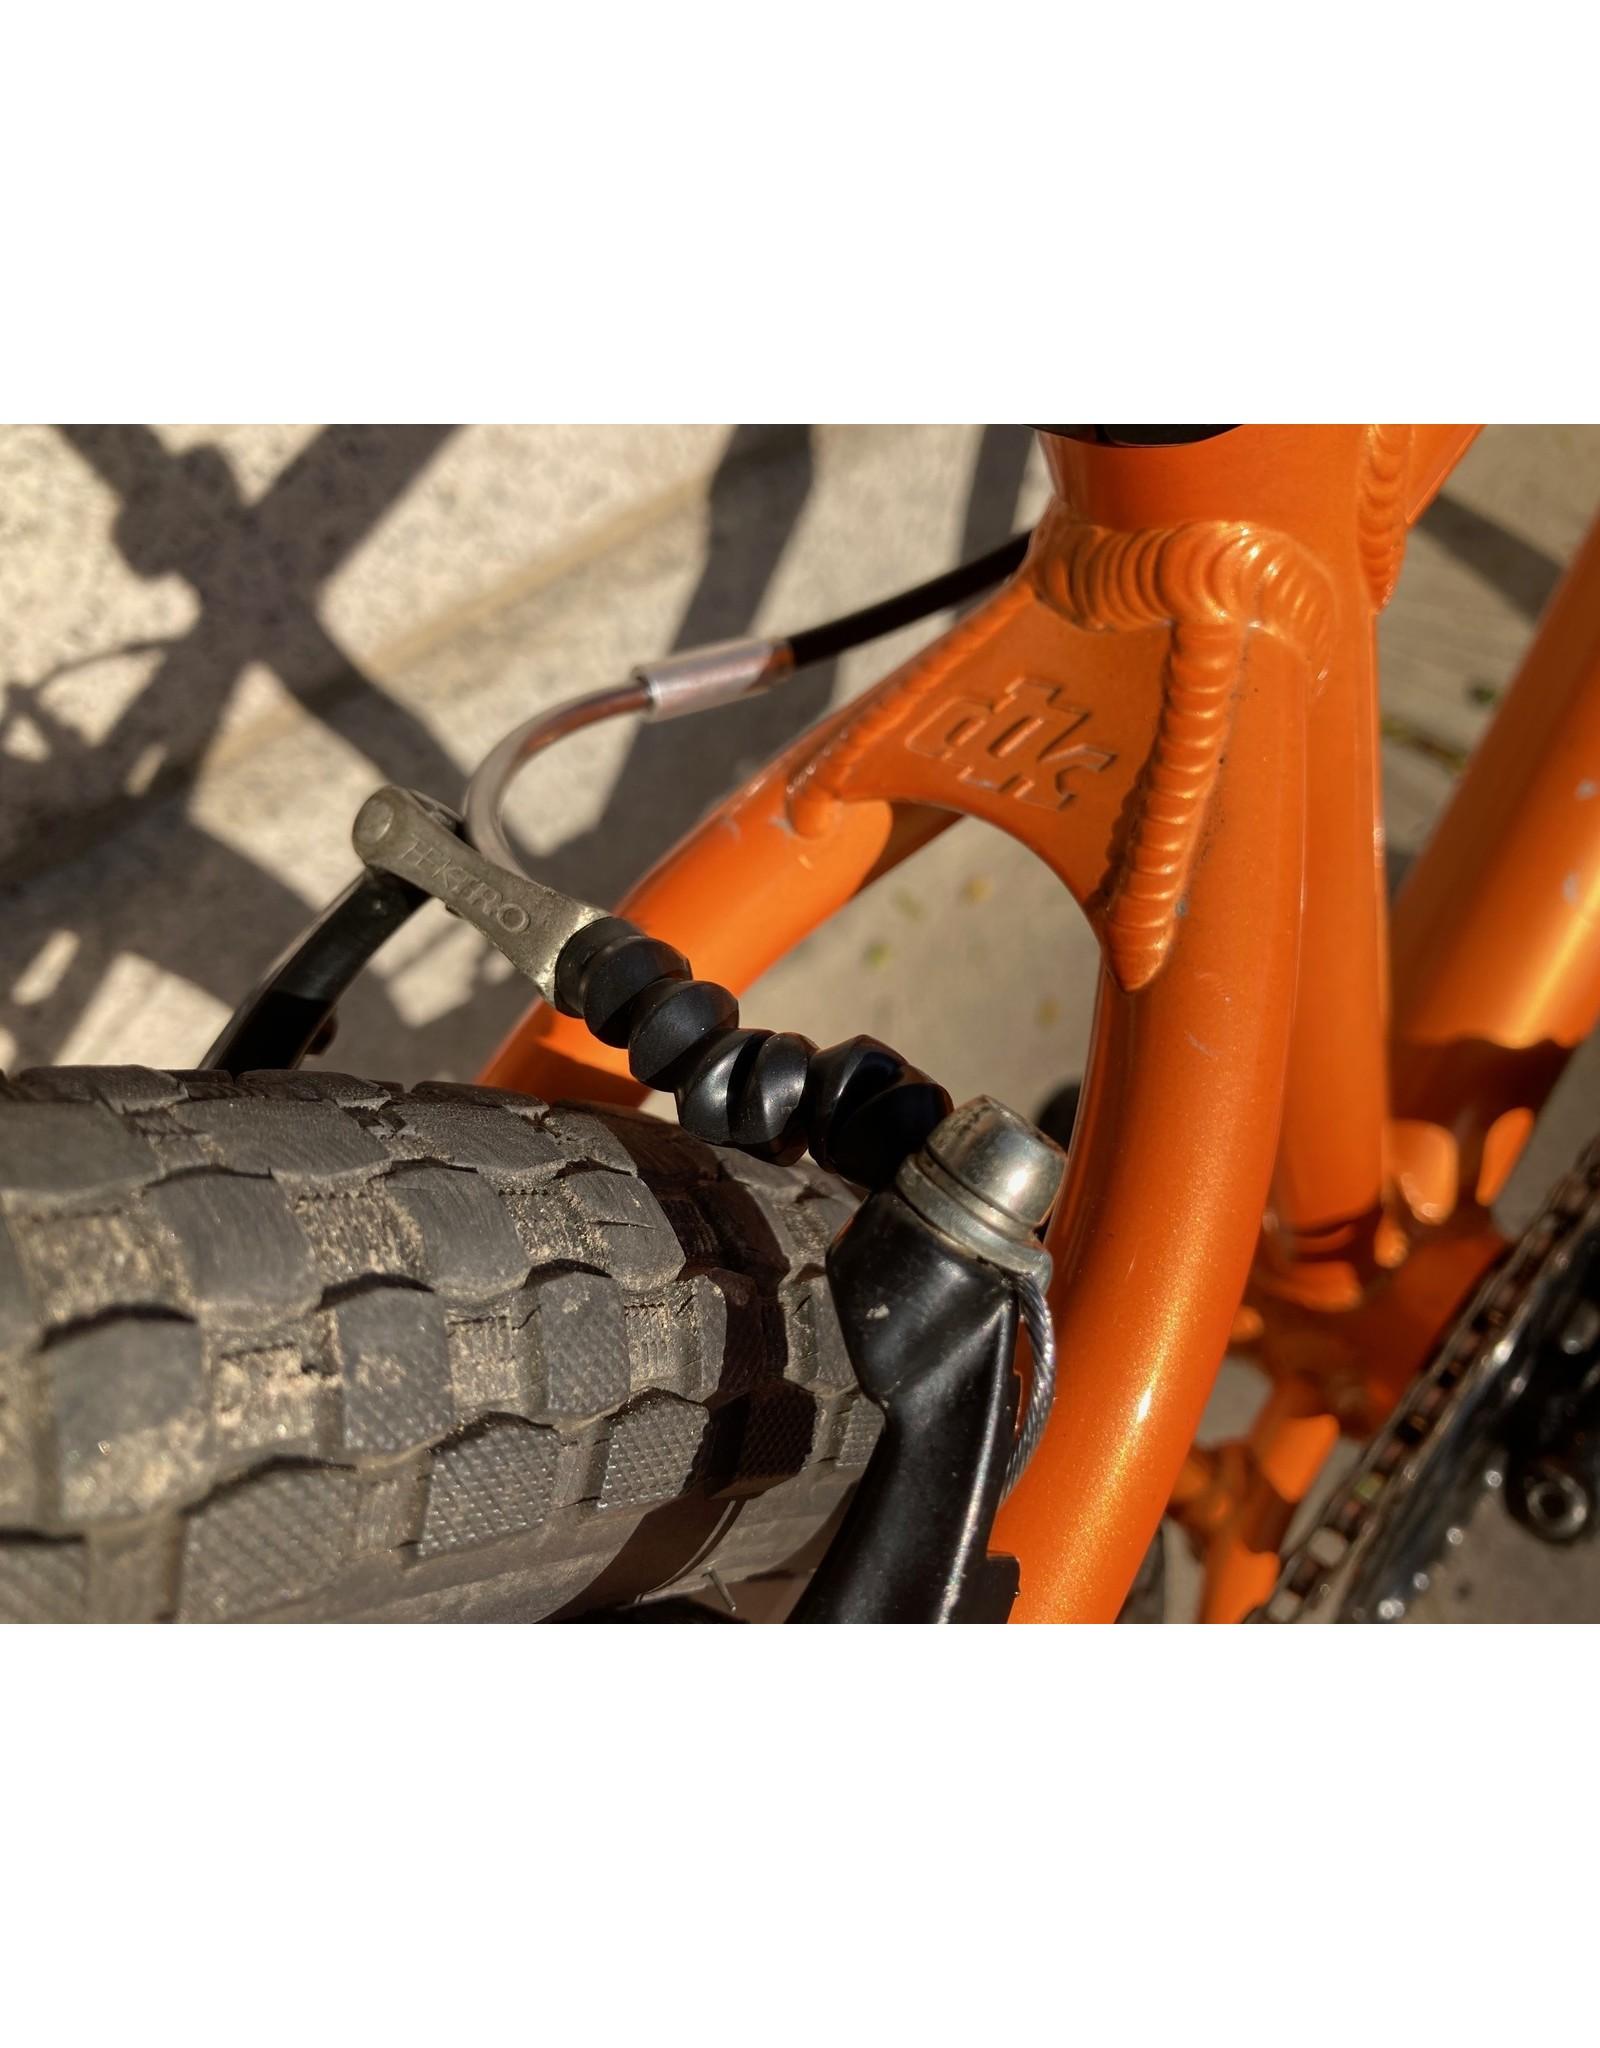 "Used Bike #8293 Orange DK BMX 24"""